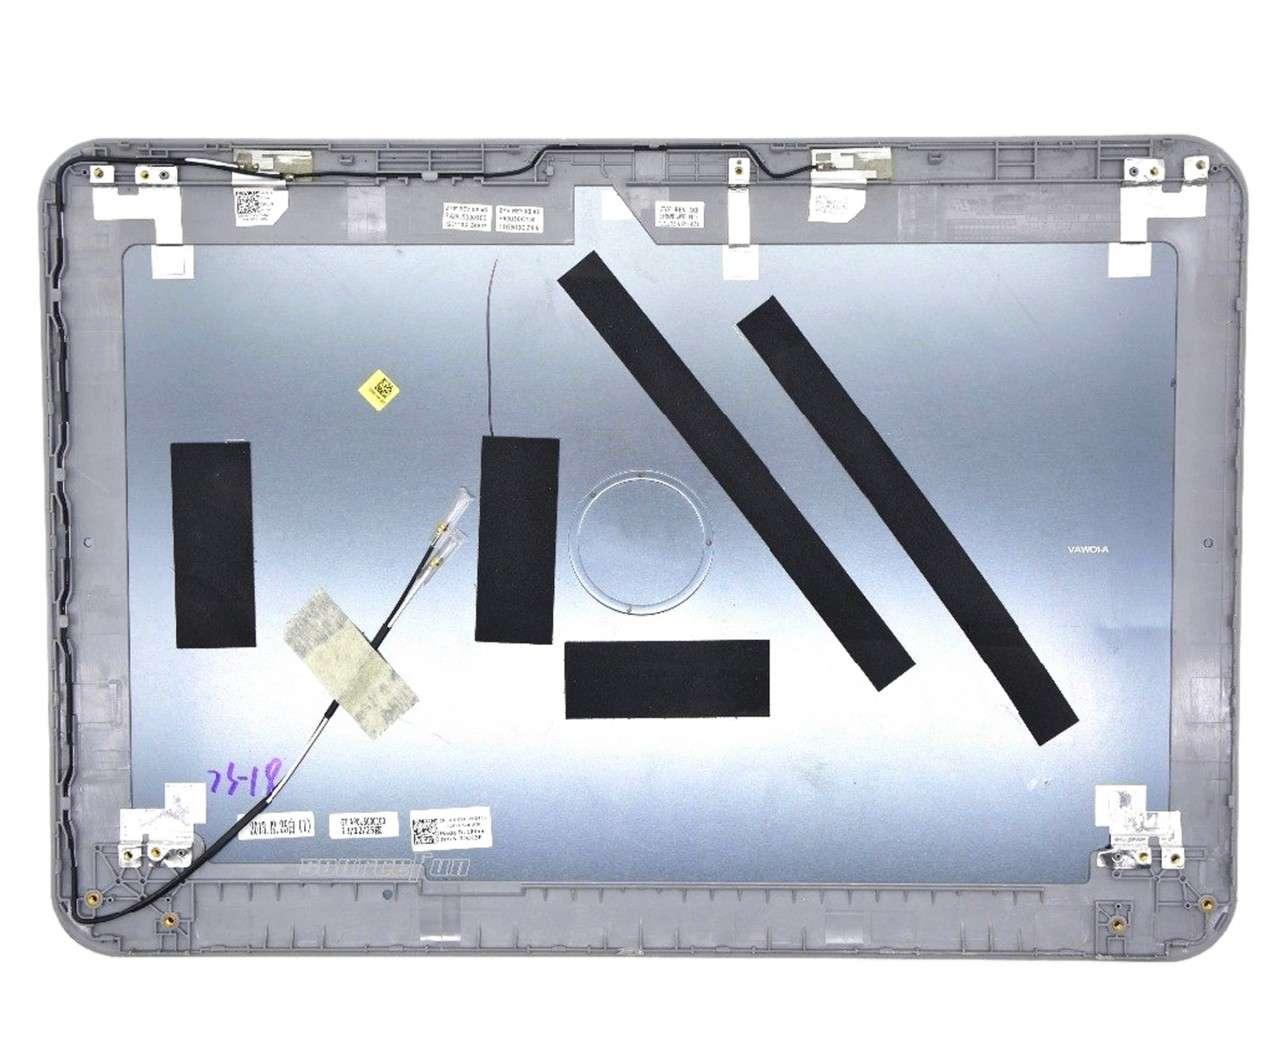 Capac Display BackCover Dell Inspiron 3521 Carcasa Display Gri Metalic imagine powerlaptop.ro 2021